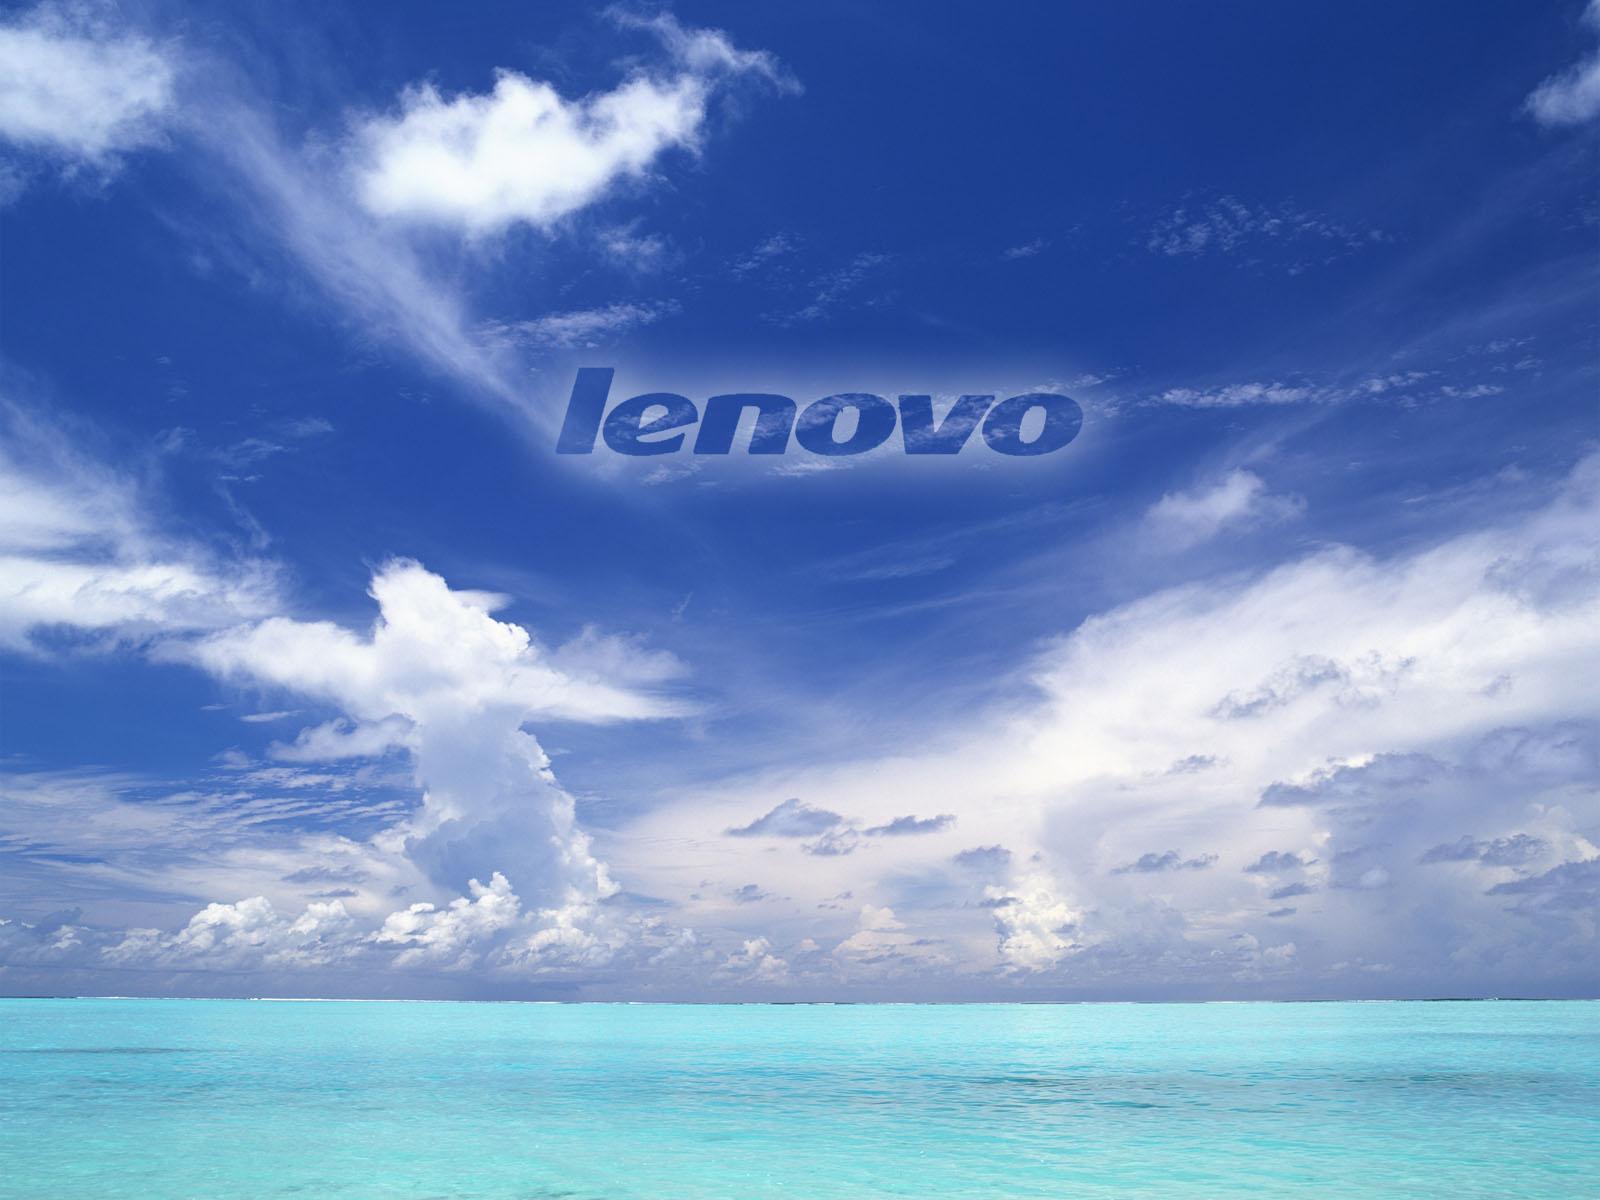 Lenovo Hd Wallpaper: Lenovo Wallpaper Theme